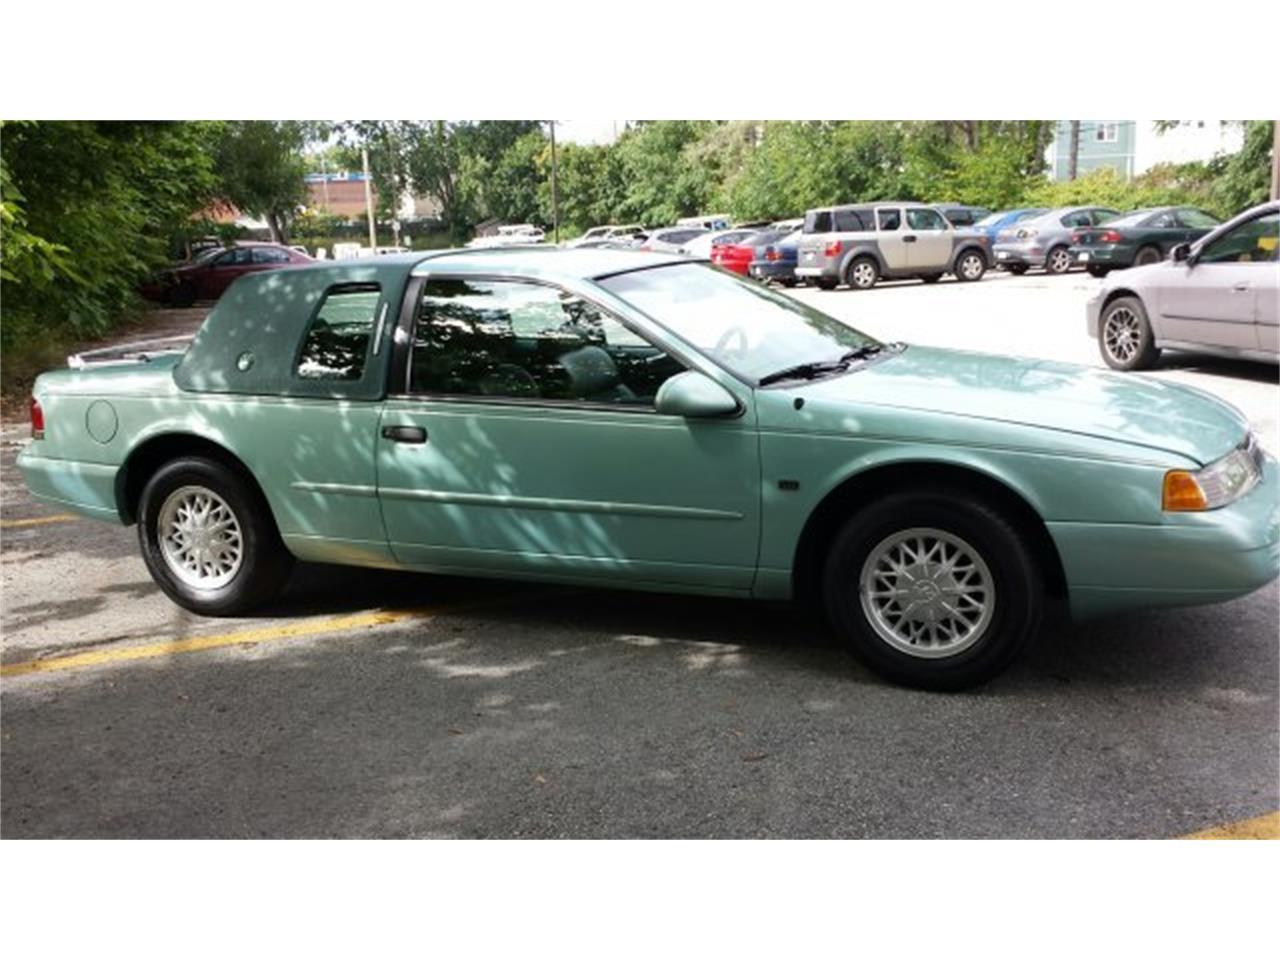 1994 mercury cougar for sale classiccars com cc 1089510 1994 mercury cougar for sale